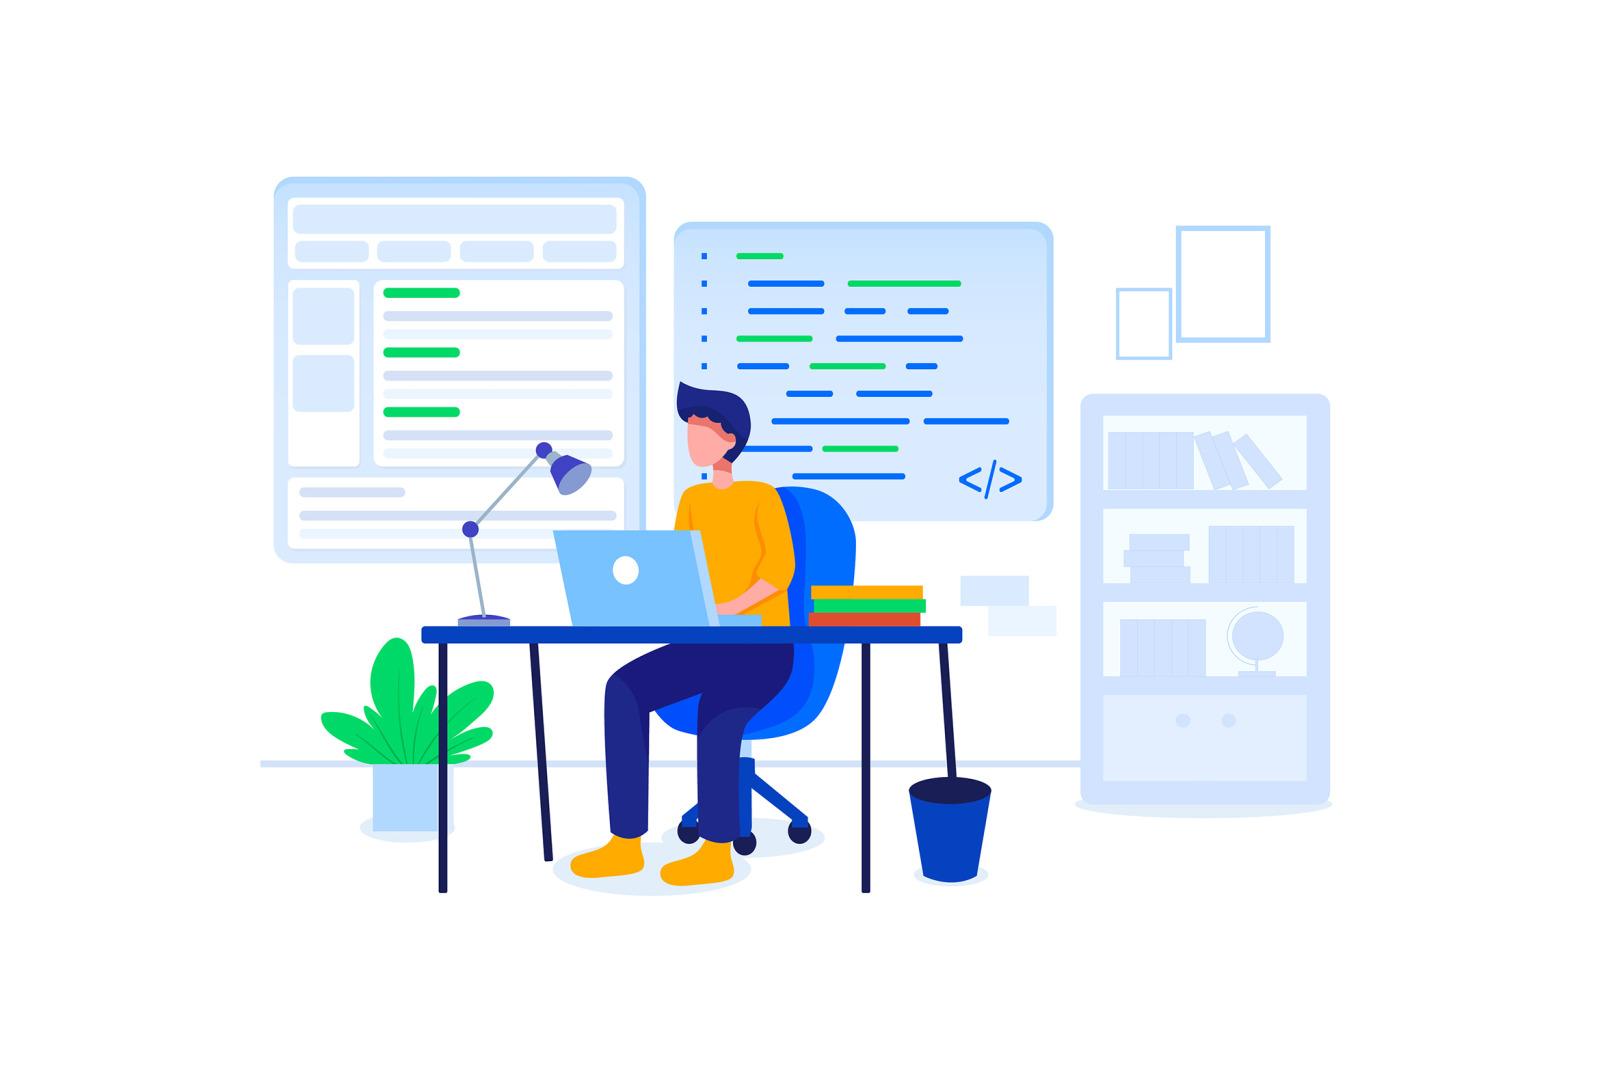 [Part 18] Website Illustrations Set